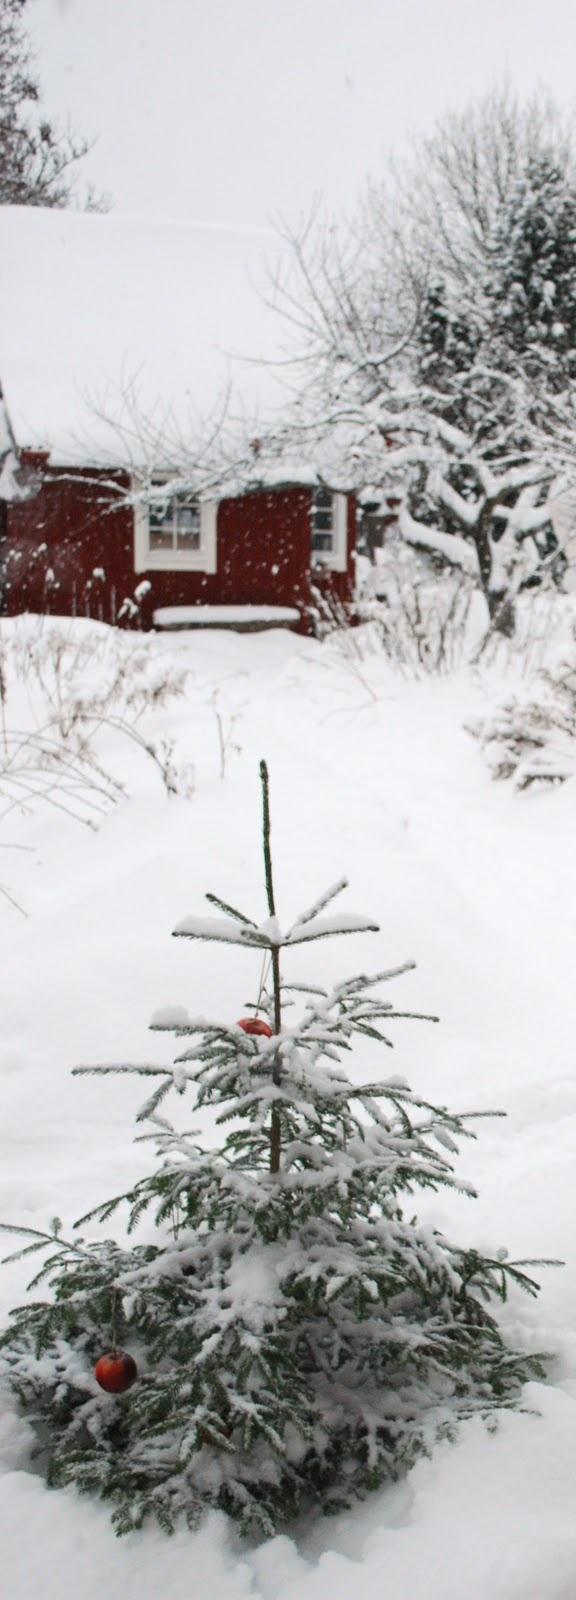 Winter on the farm.. :)Christmas Time, Winter Scene, Snow, Winter Wonderland, White Christmas, Country Christmas, Christmas Trees, Charlie Brown